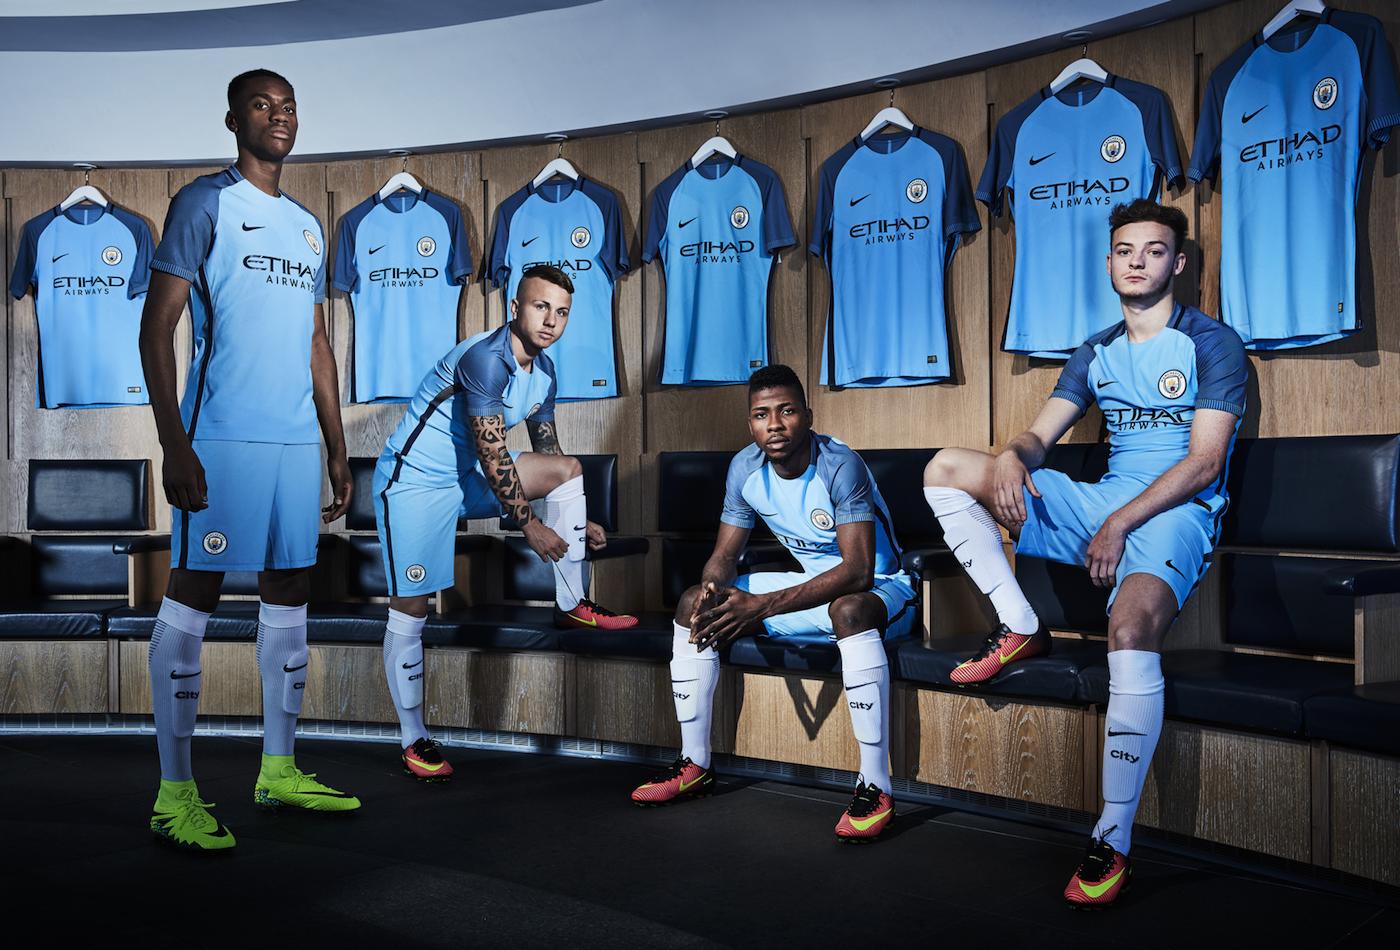 2f7a8e37 2016/17 Nike Home Kits: Manchester City, PSG & Barcelona — Soccer City  Sports Center